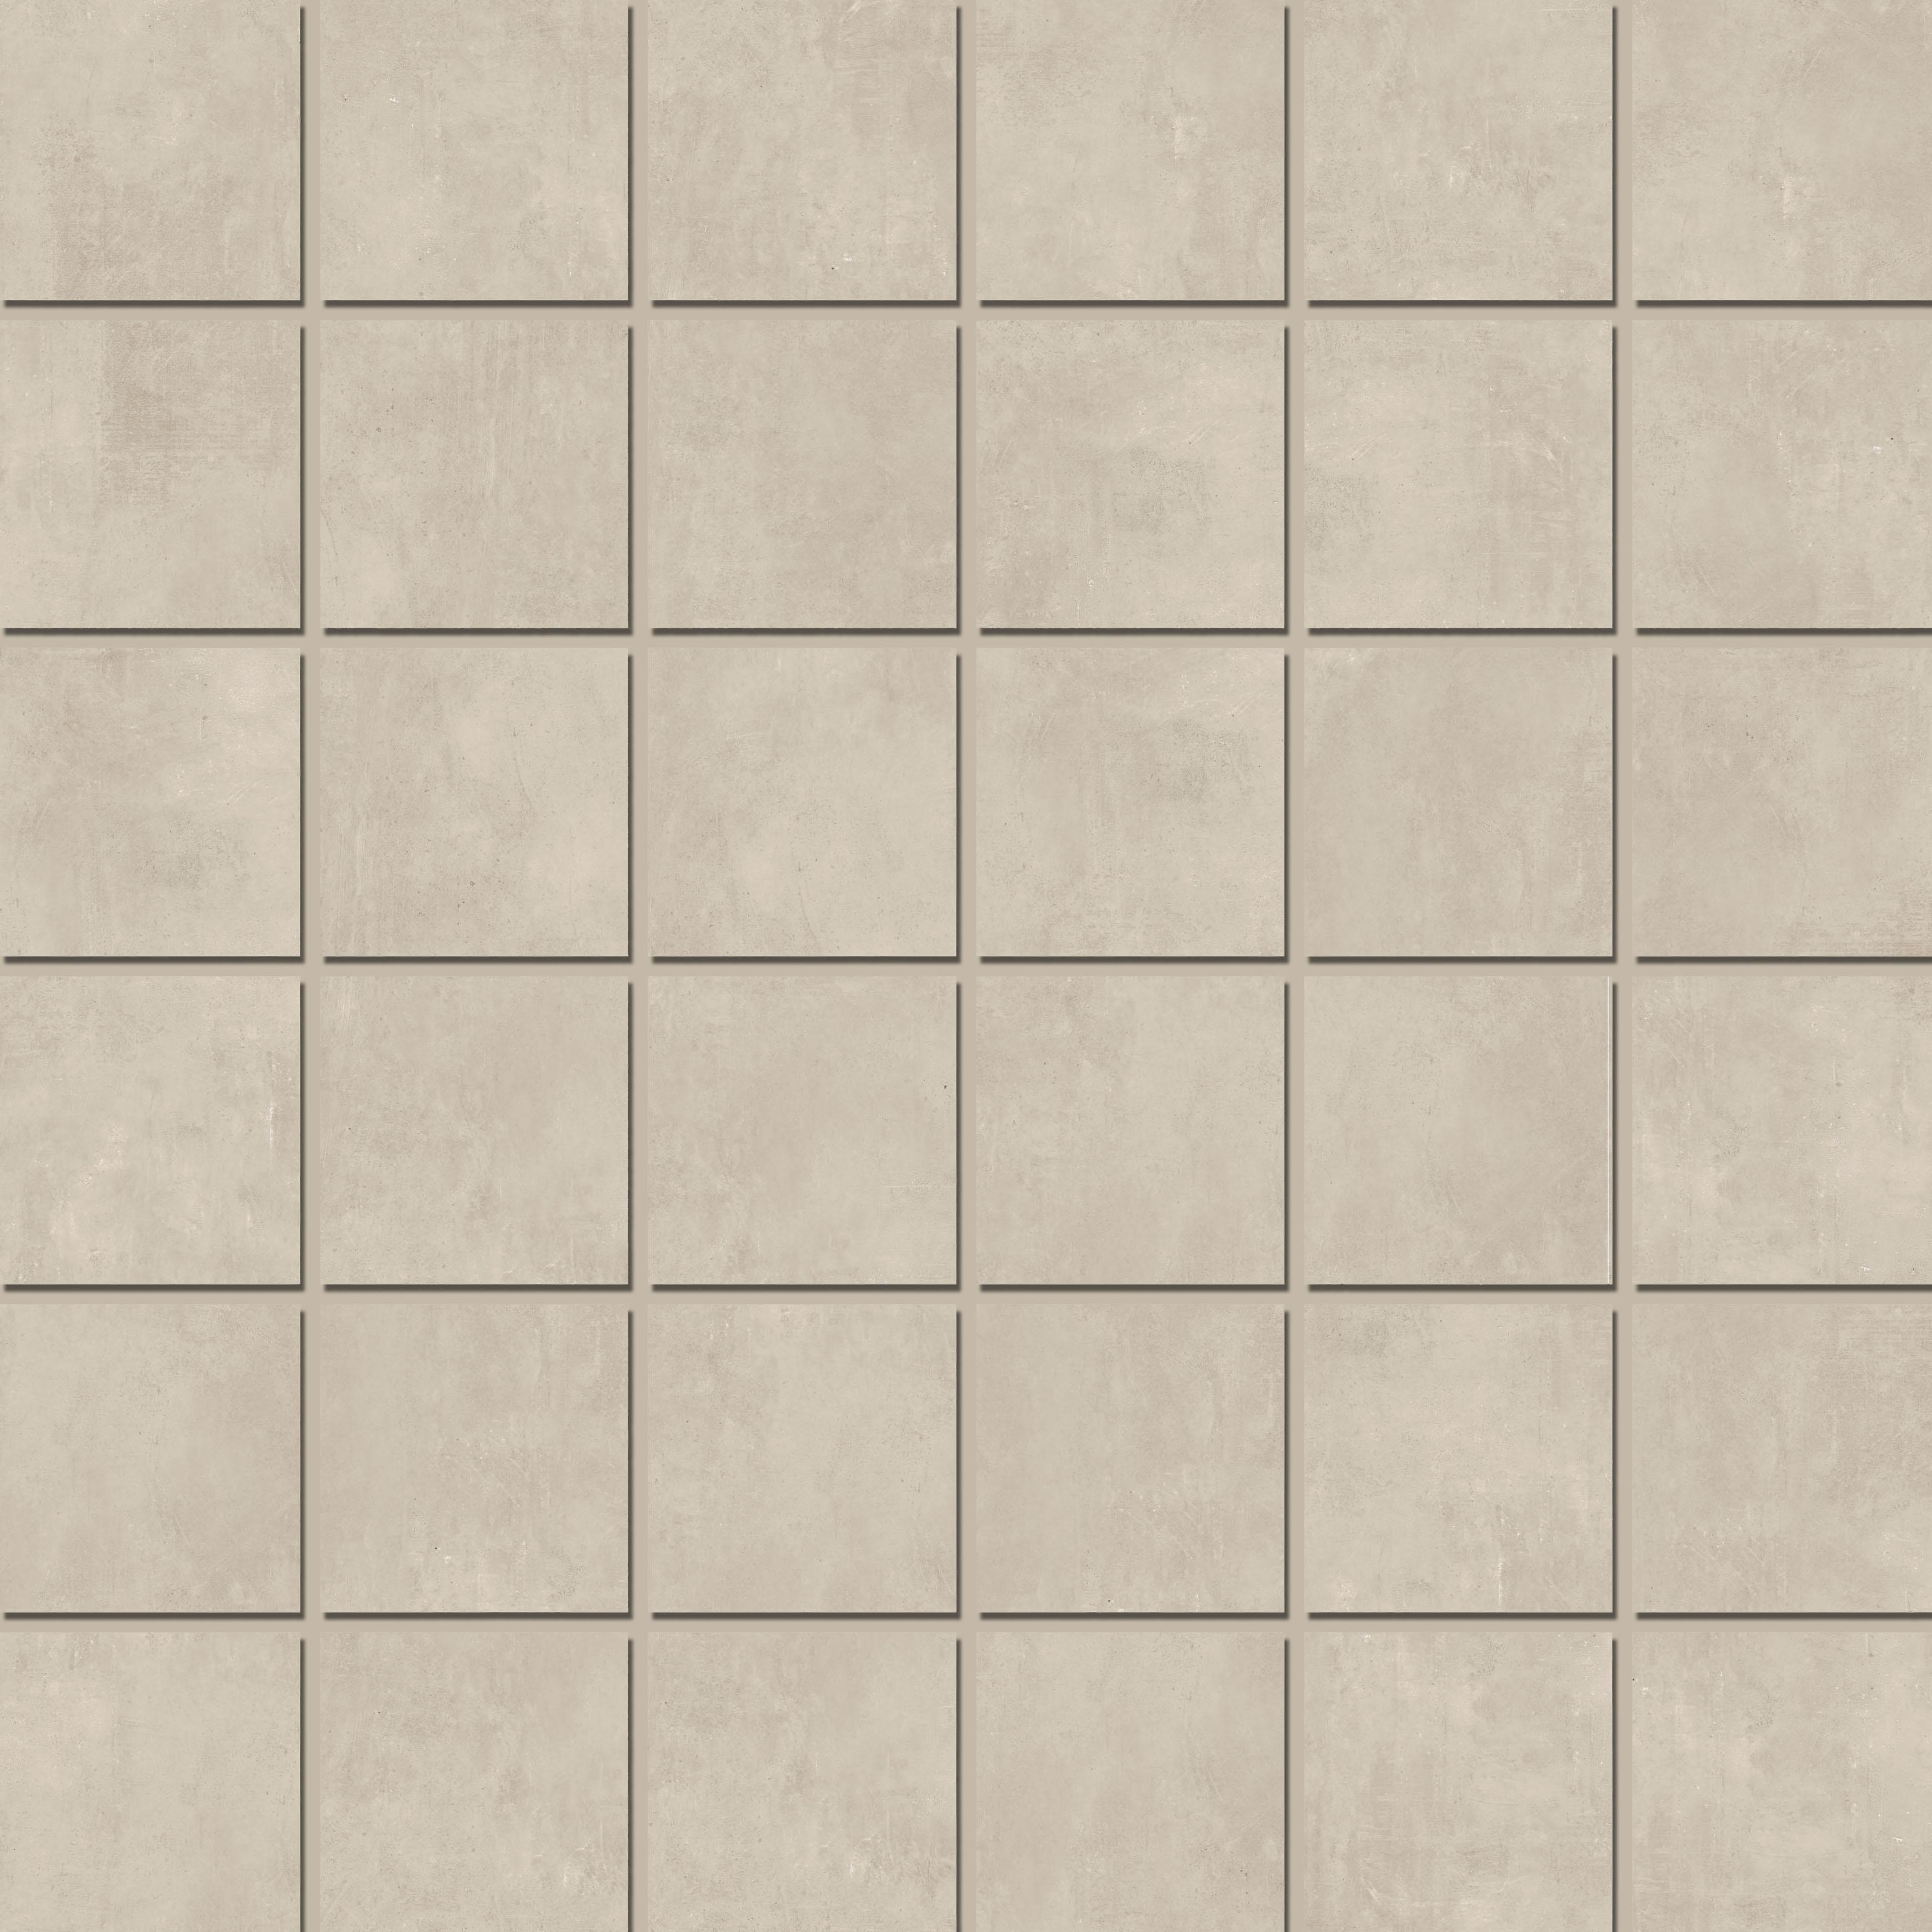 Mosaic 4,7x4,7 Sand